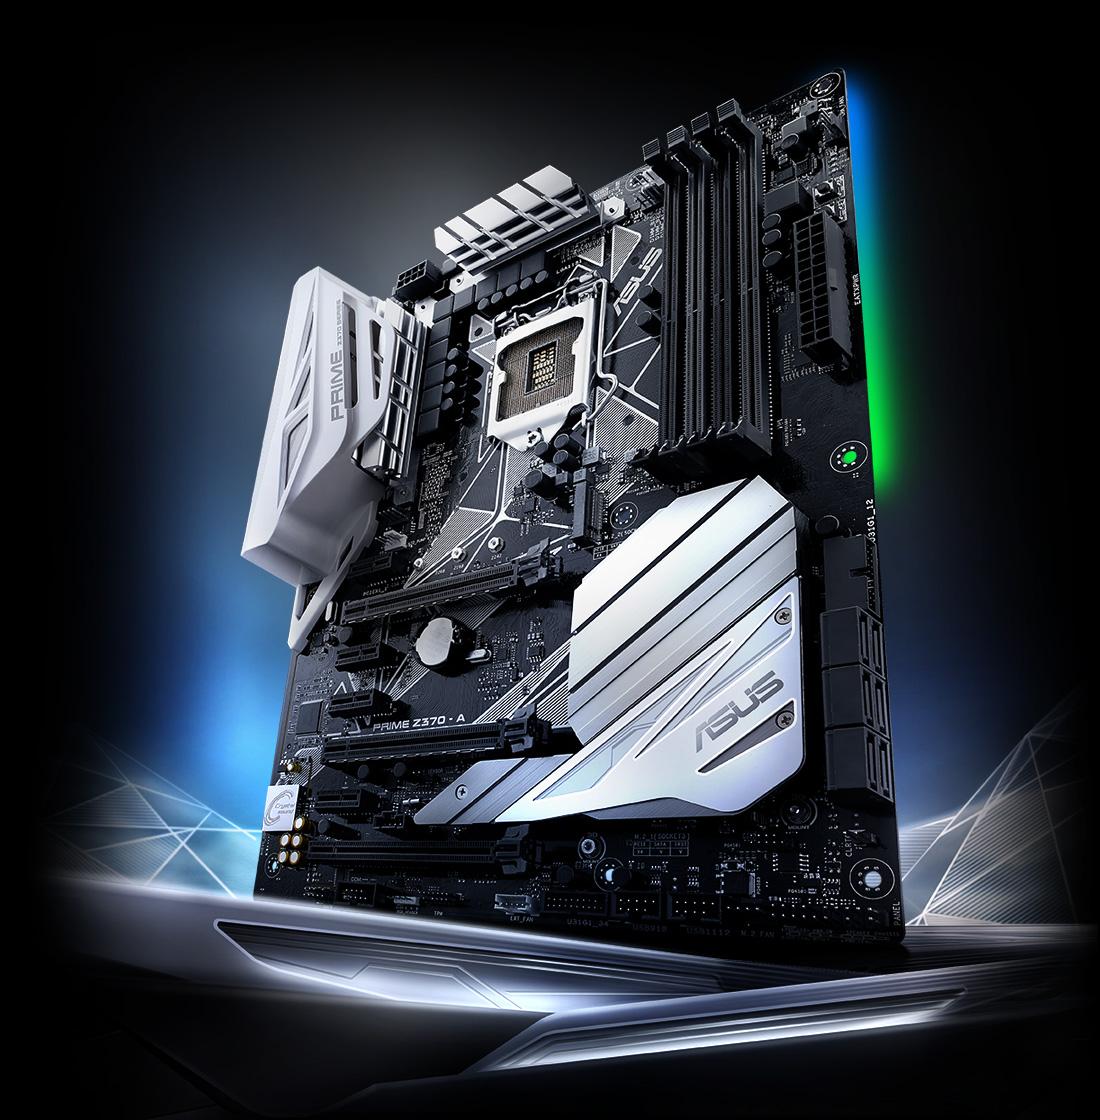 Prime Z370 A Motherboards Asus Canada Adjustable Radiator Fan Wiring Diagram Control Flex Cpu Intel Lga 1151 I7 8700k Motherboard Dram Gskill 3333 8g2 Power Corsair Ax1500i Water Cooling H115i Os